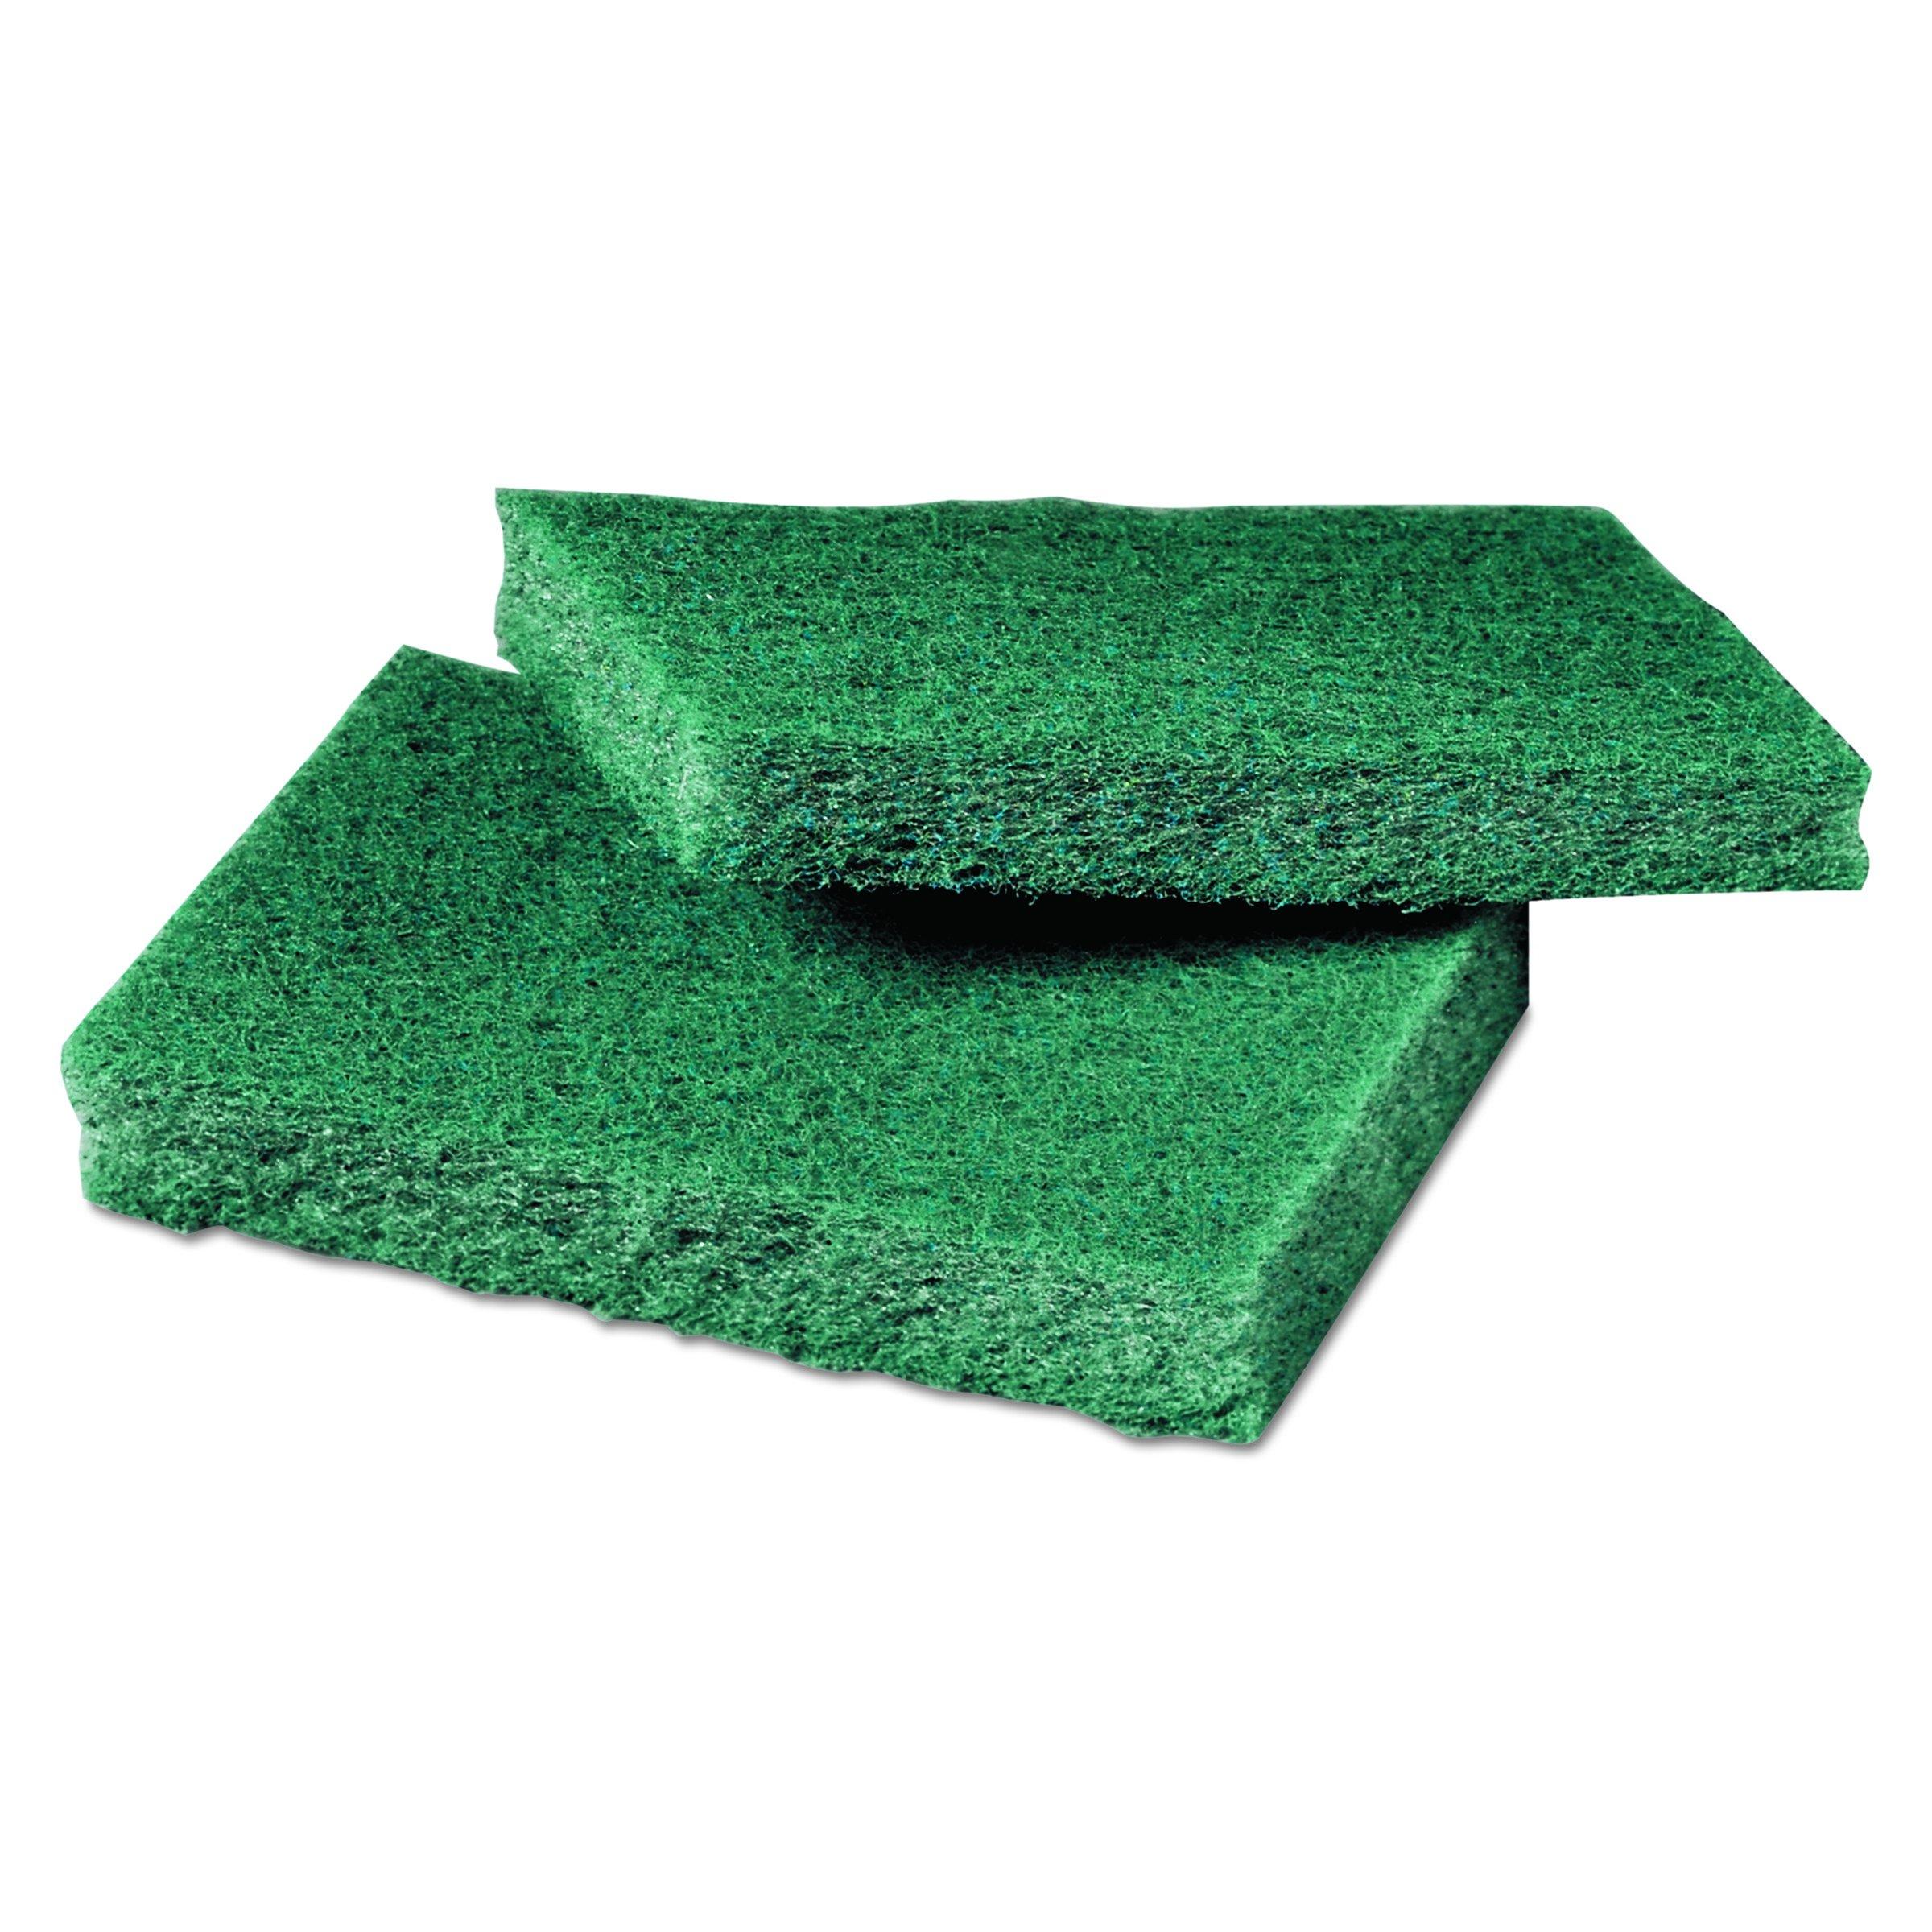 Scotch-Brite PROFESSIONAL 59166 General Purpose Scrub Pad, 3w x 4 1/2l, Green, Box of 40 (Case of 2 Boxes)